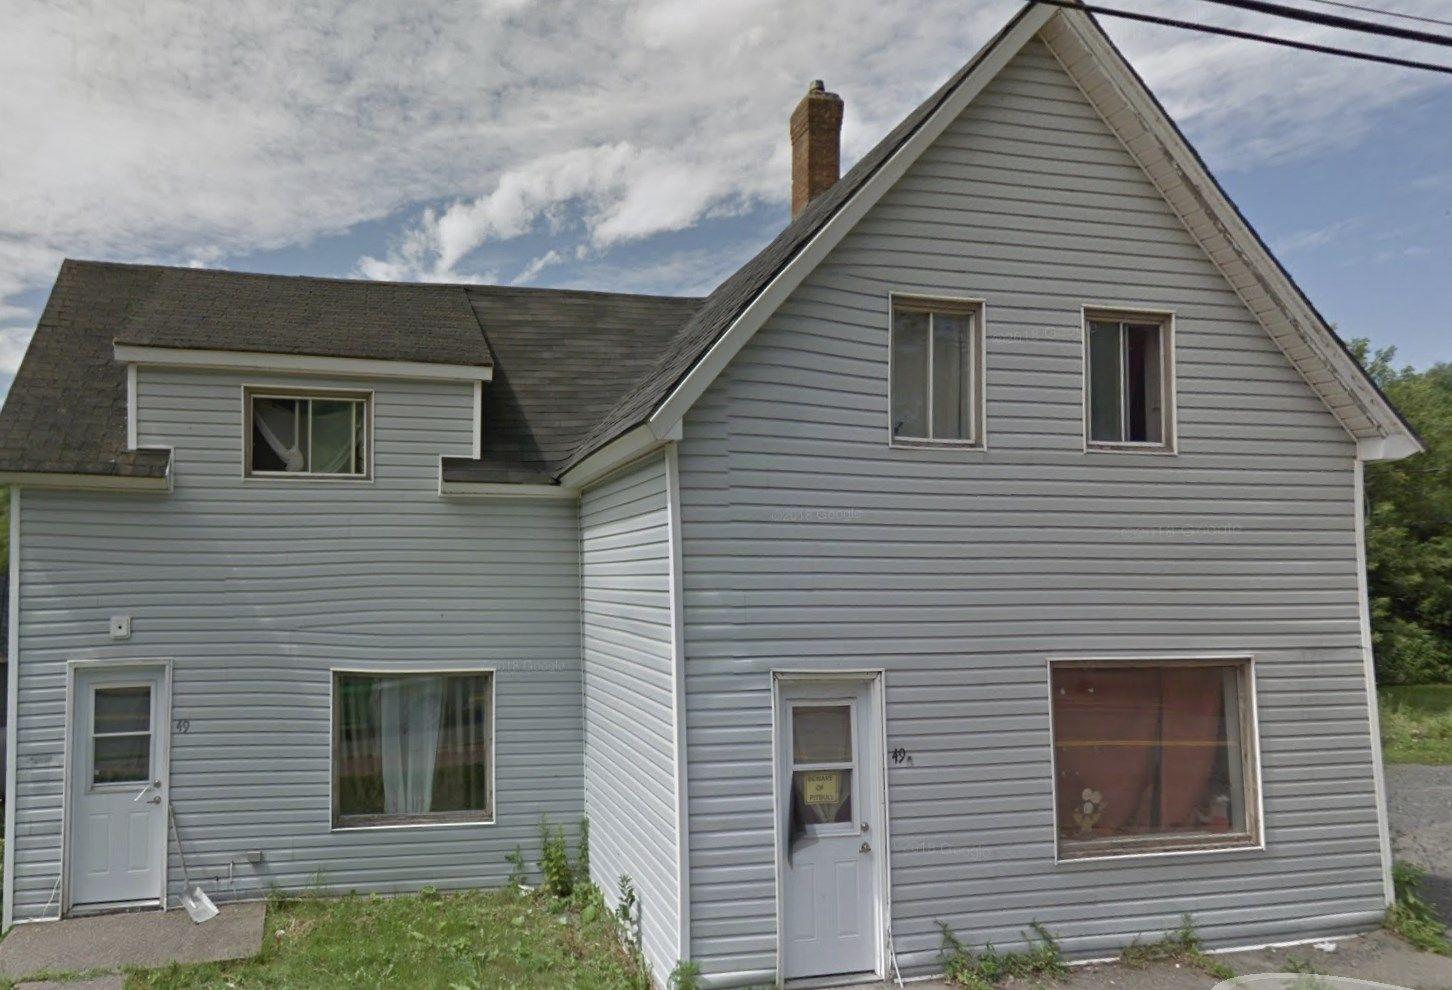 Main Photo: 49 MAIN Street in Trenton: 107-Trenton,Westville,Pictou Multi-Family for sale (Northern Region)  : MLS®# 202102139